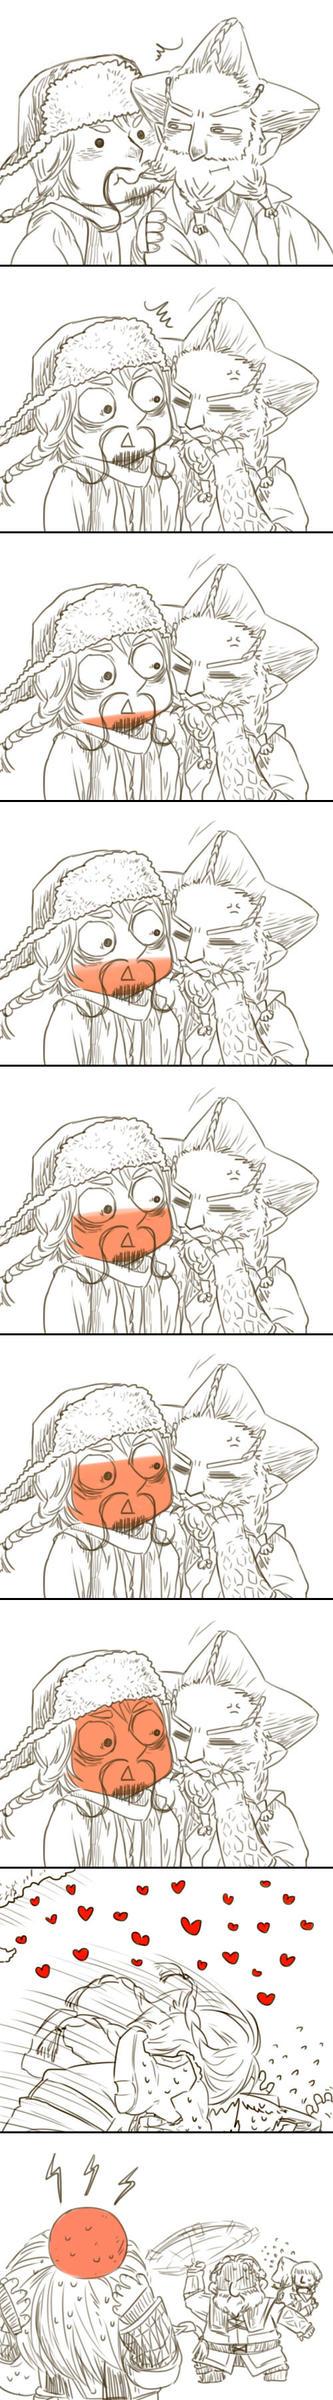 Beard and Braid by ILsama